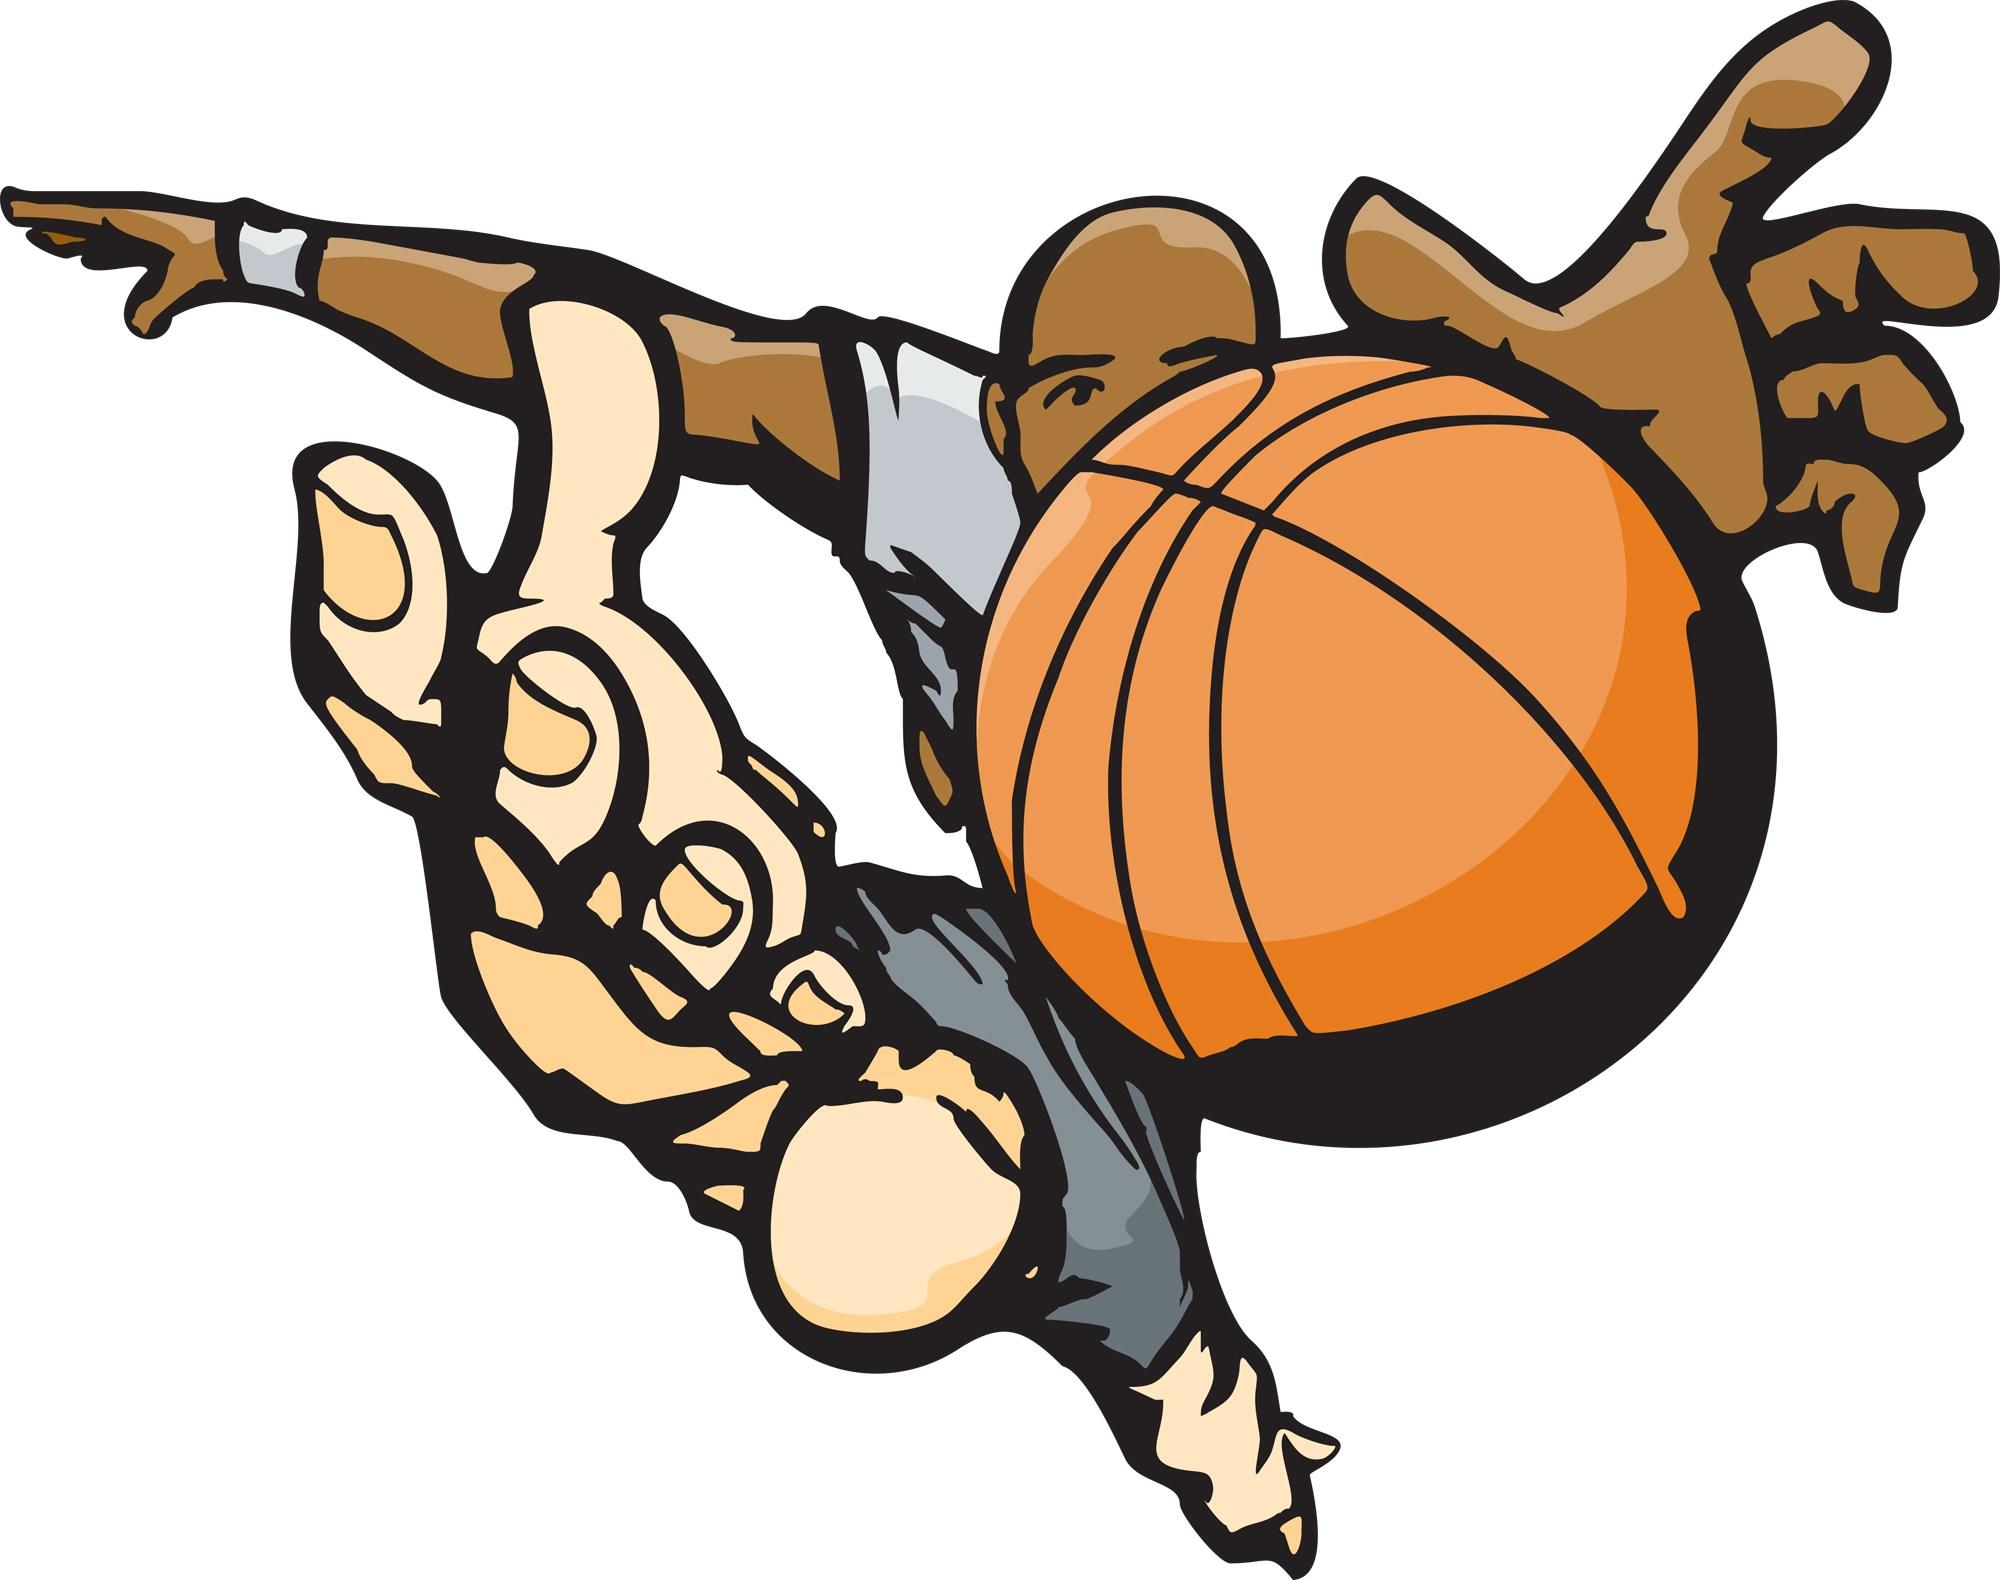 Basketball camp clipart 6 » Clipart Portal.